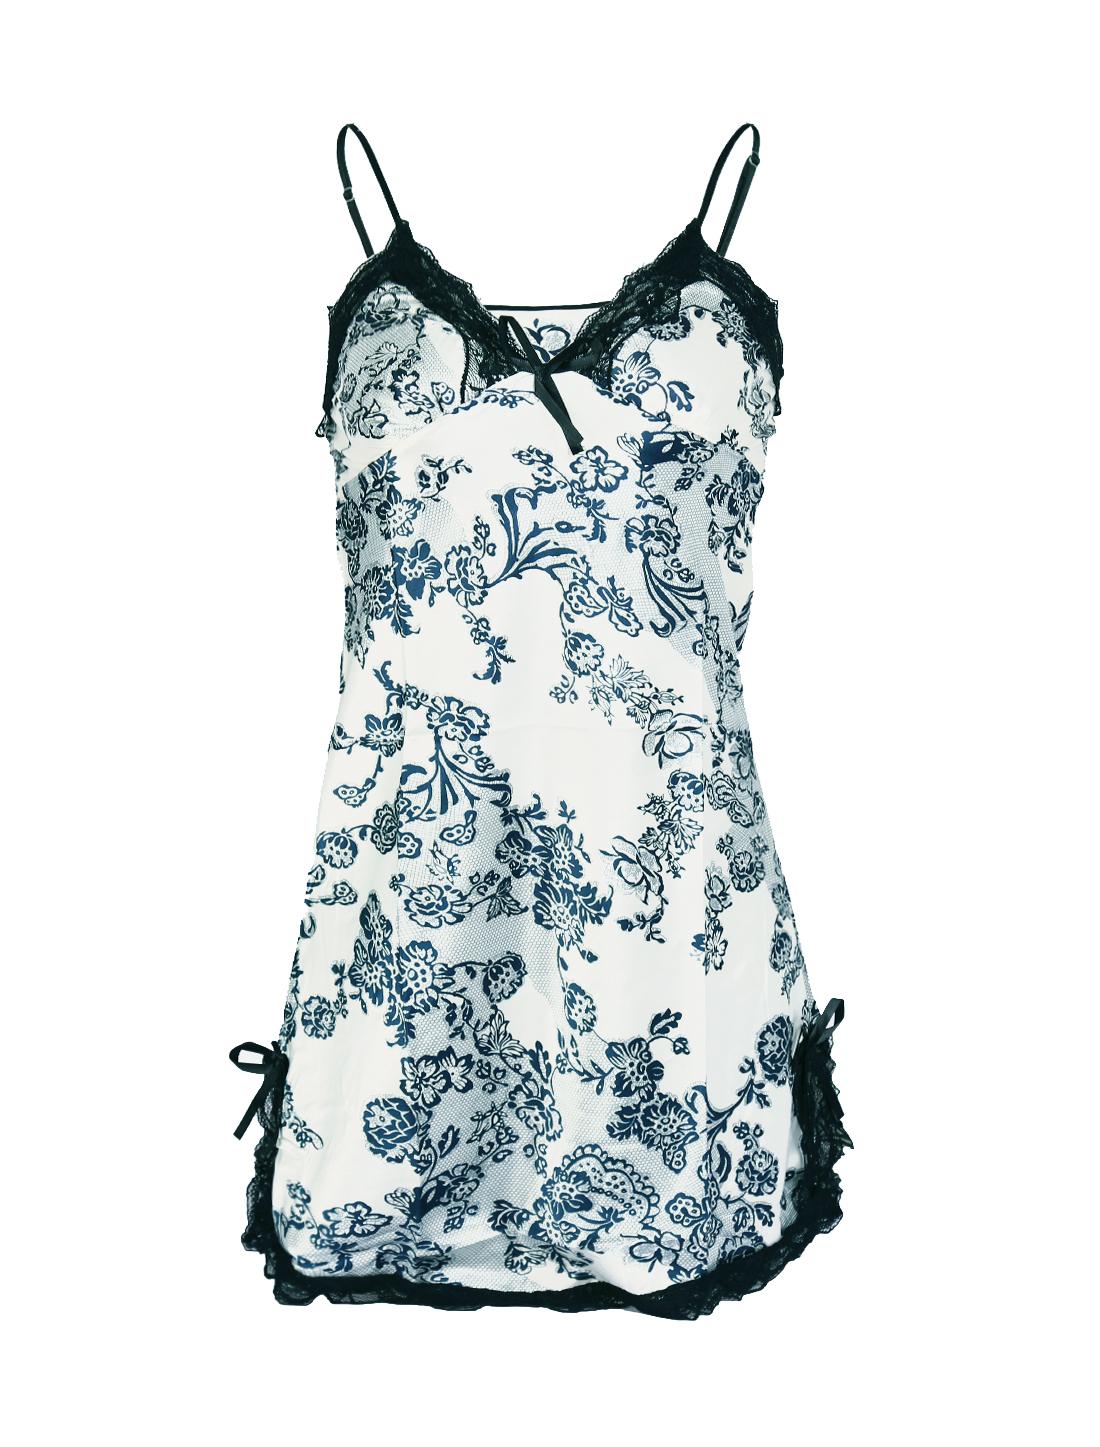 Women Satin Lace Trim Sleepwear Nightgown Pajama Slip Dress Floral-Lace L